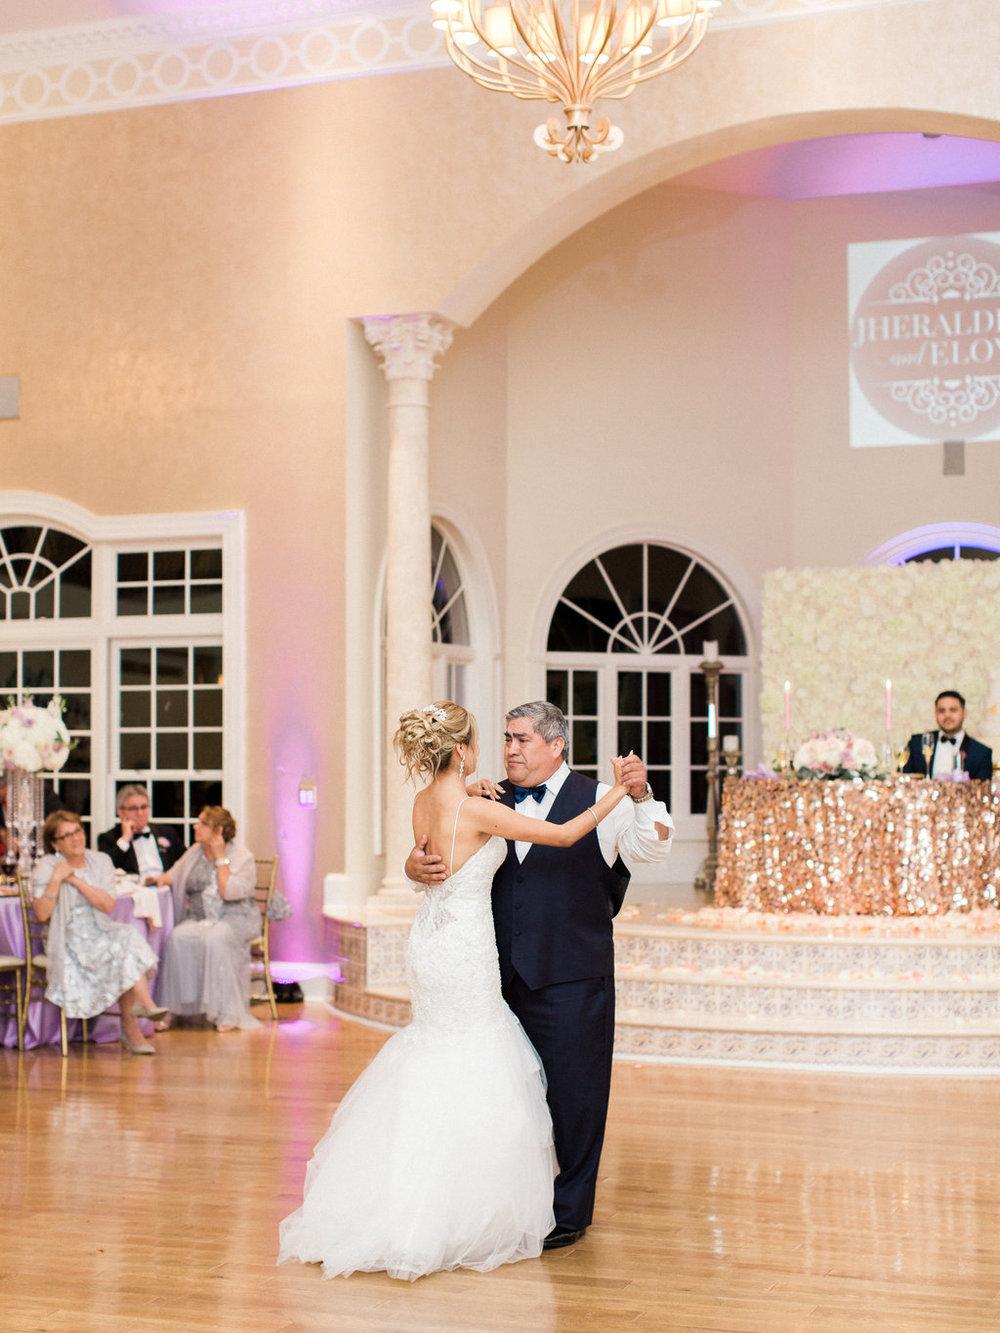 Morais-Vineyards-Winery-Beatleton-Virginia-Wedding-Photographer-77.jpg